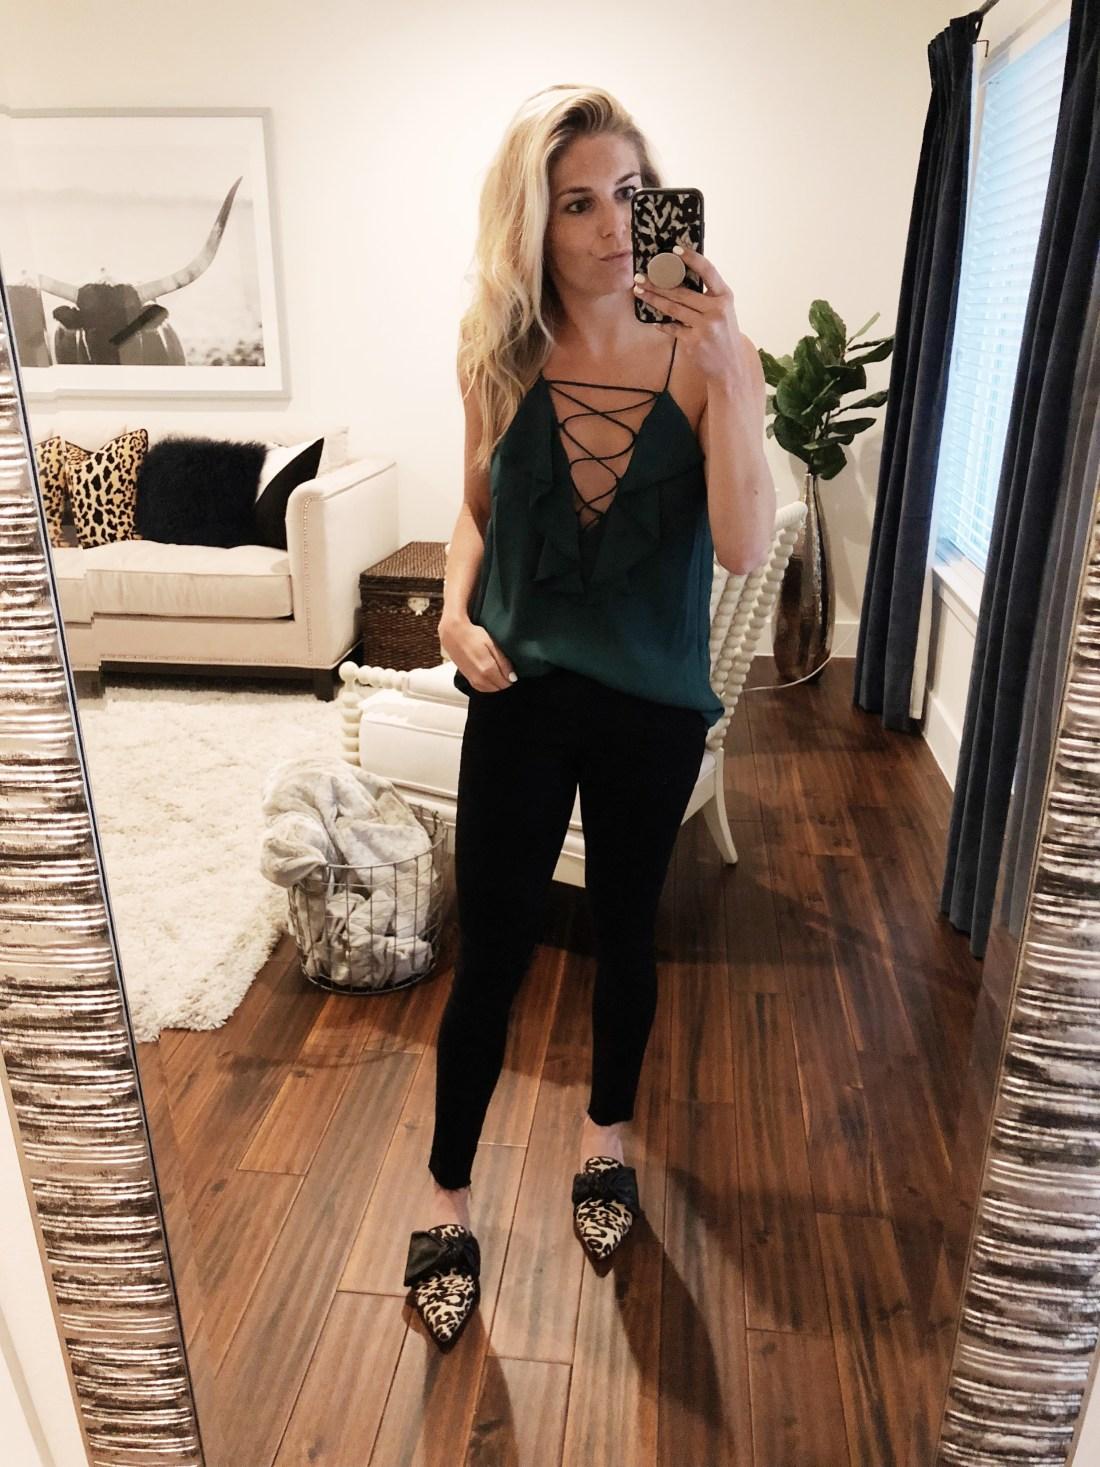 WAYF Green Lace-Up Ruffle Cami // Size M (go a size up)  Rag & Bone Black Jeans // Size 25  Louiso Et Cie Leopard Flats // Size 7 1/2